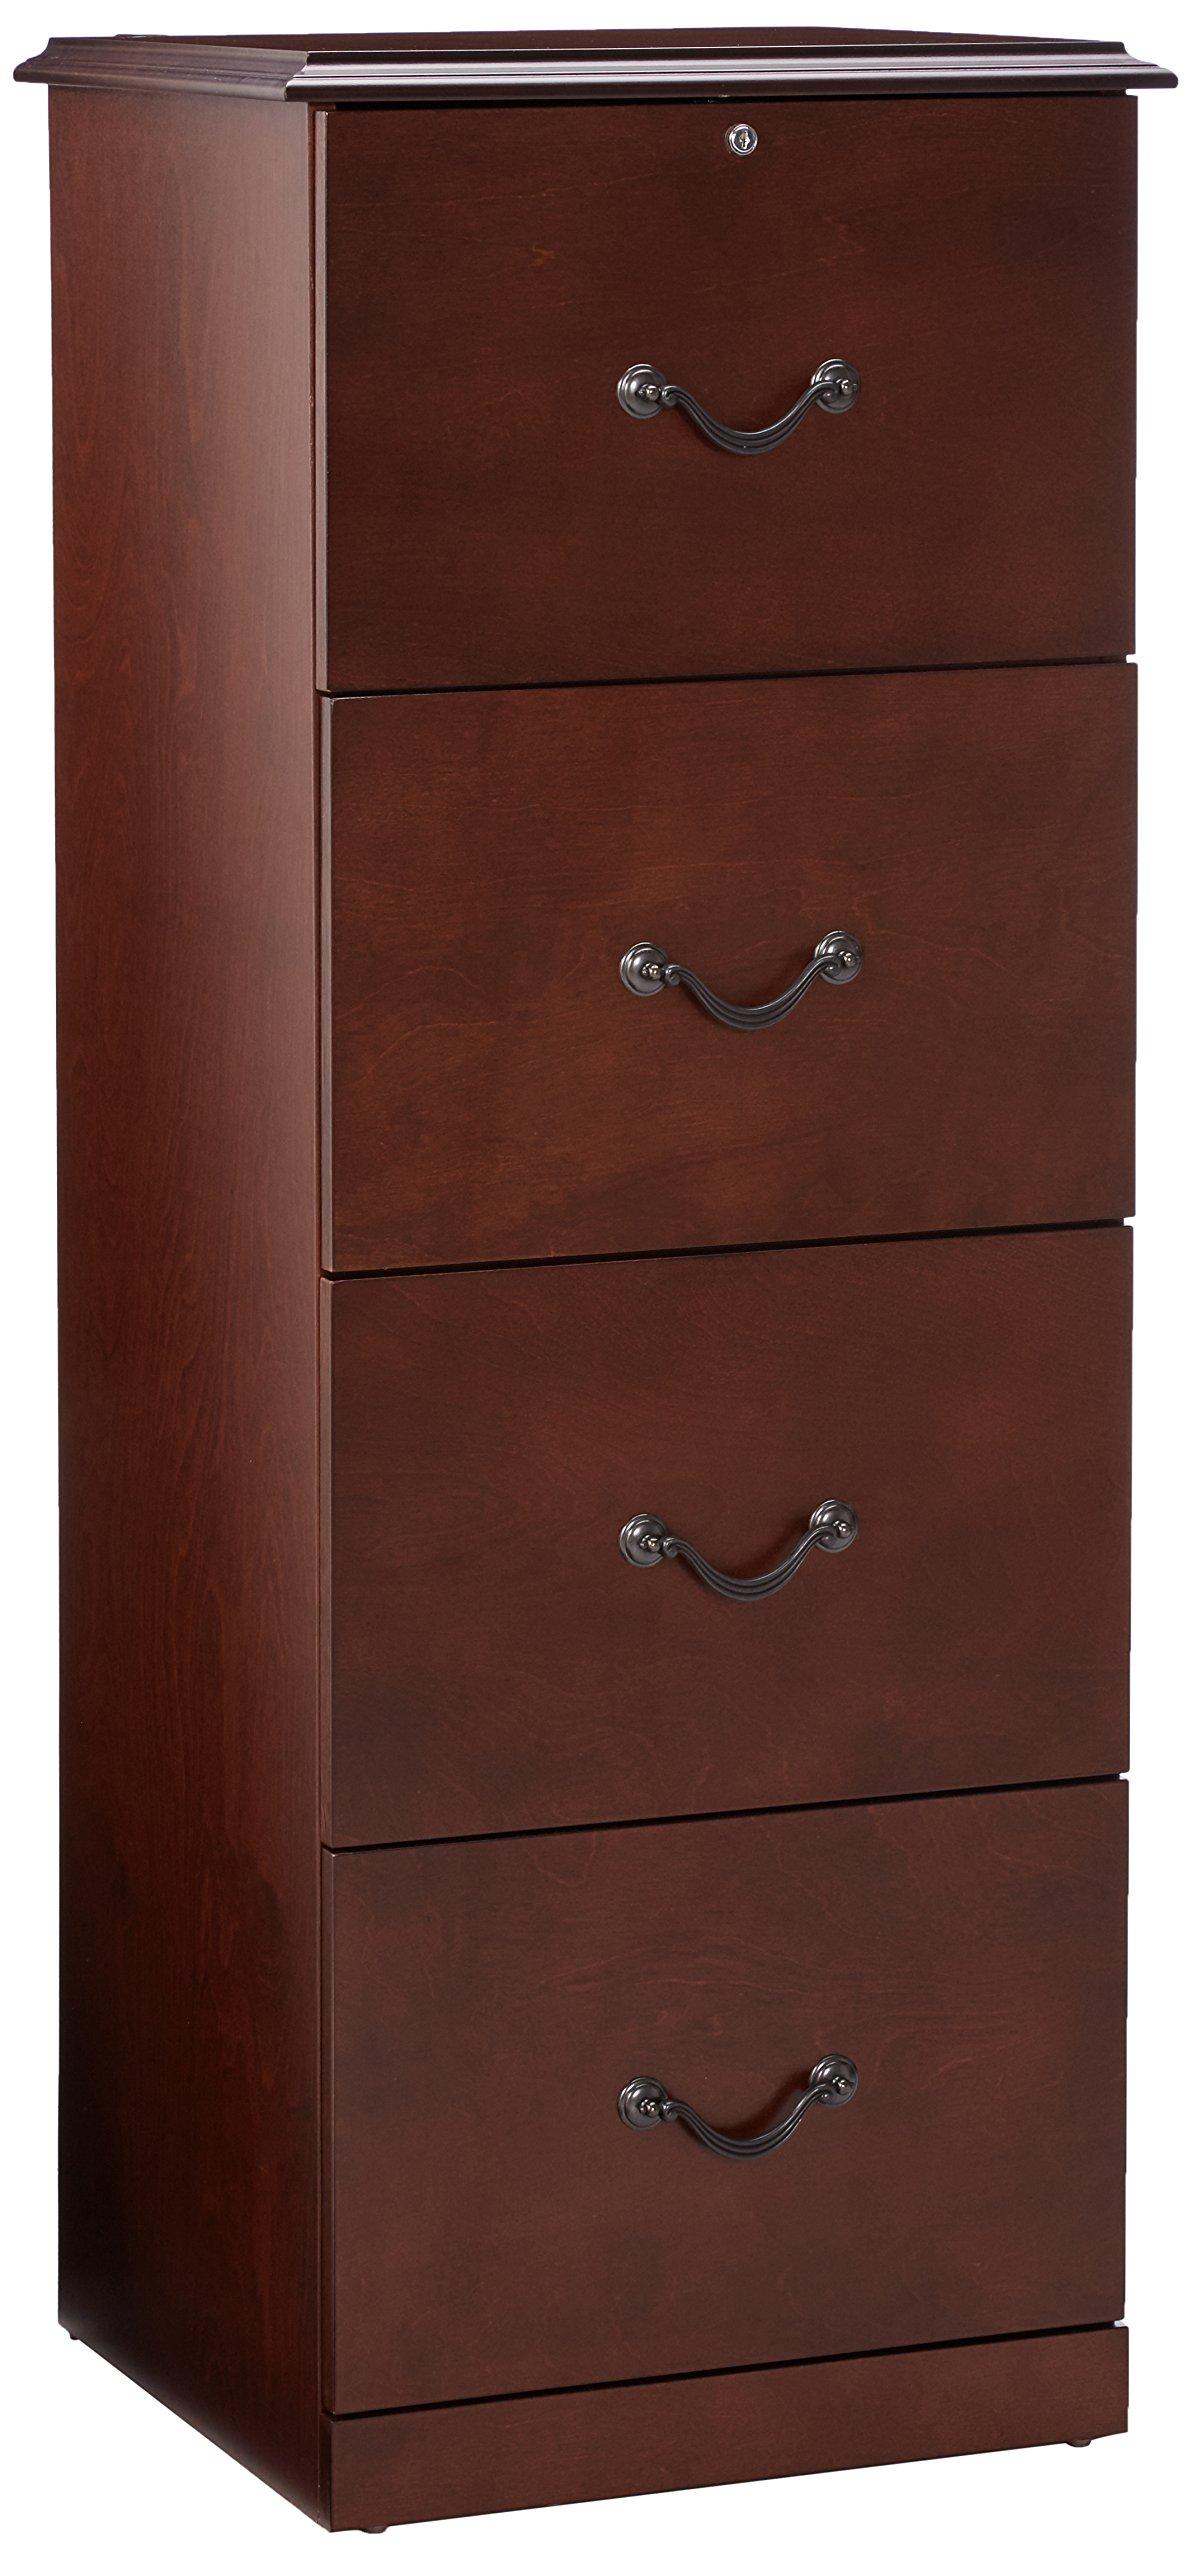 Z-Line Designs ZL9990-24VFU 4-Drawer Vertical File Cabinet, Cherry by Z-Line Designs